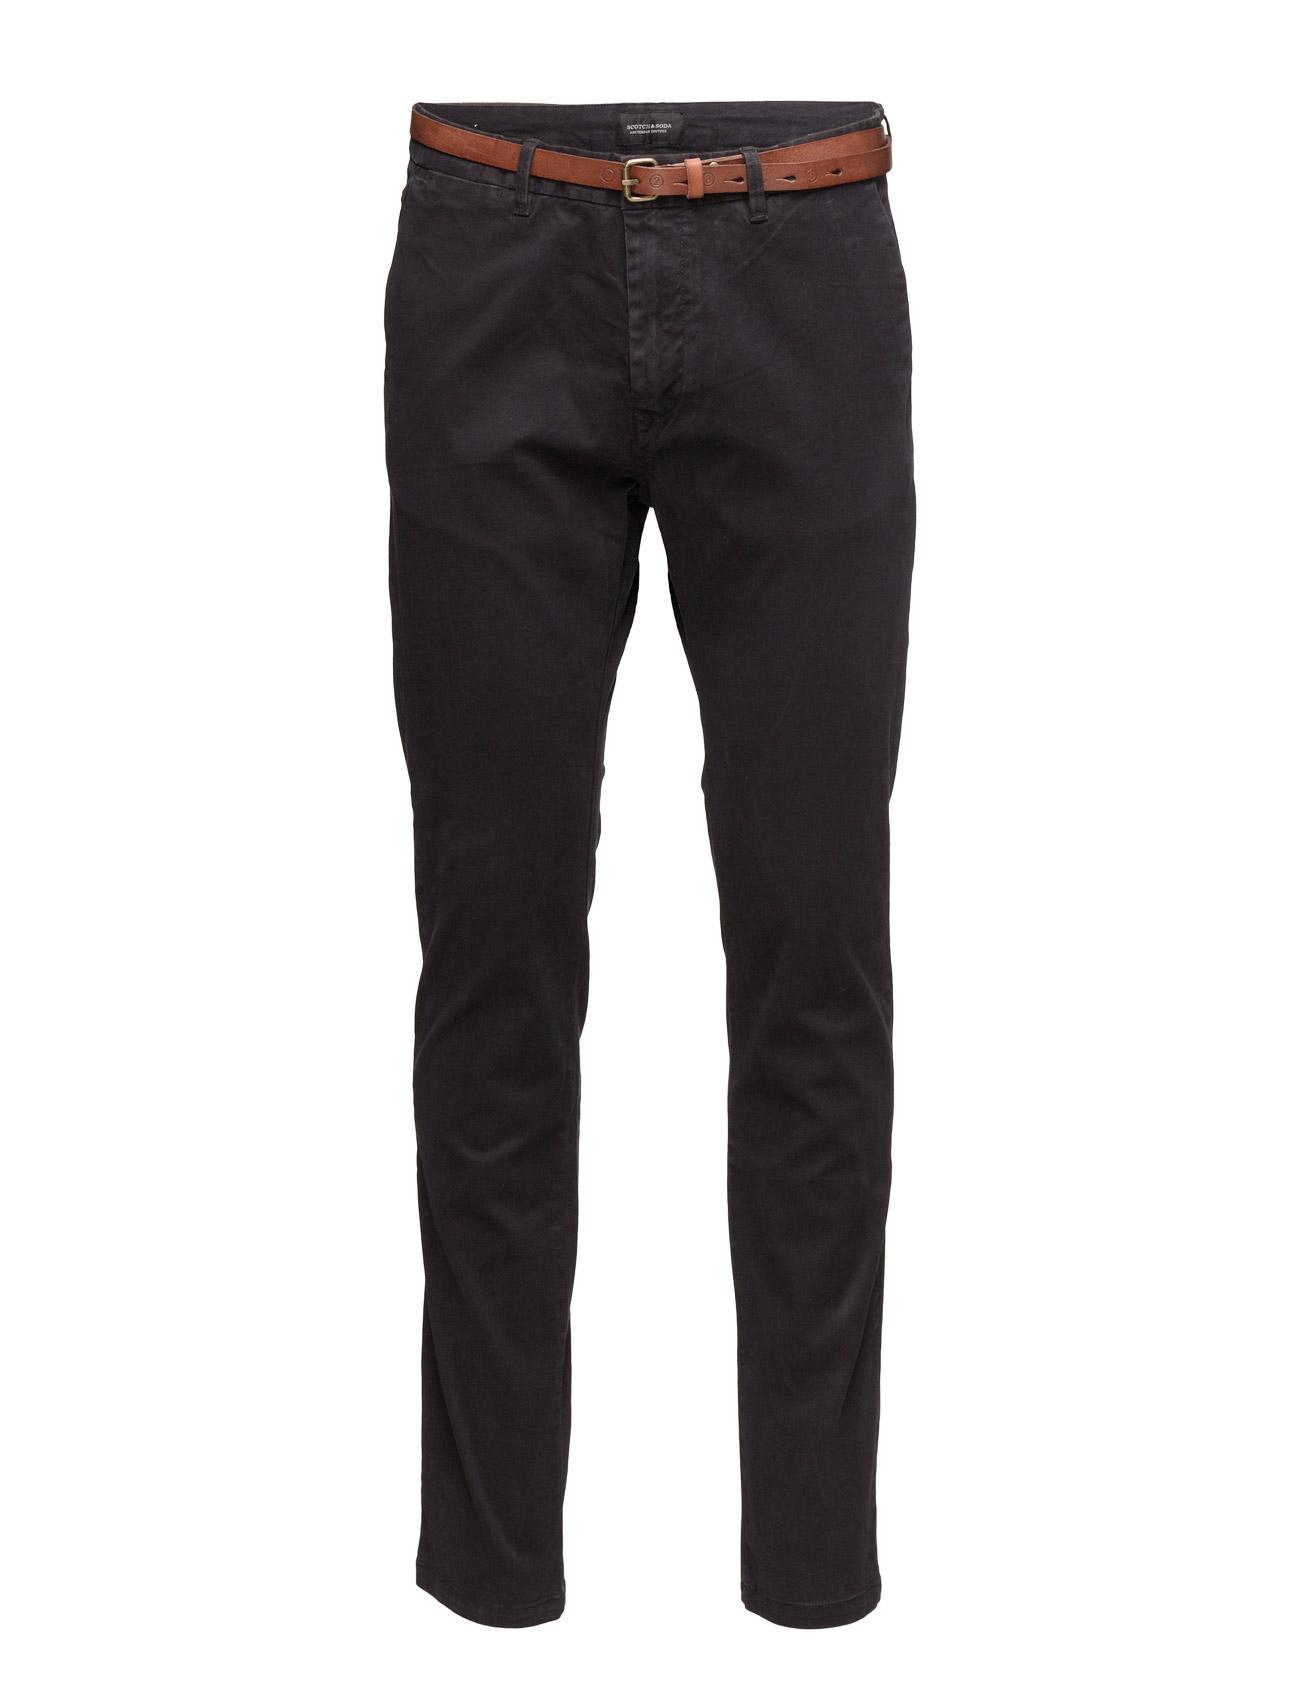 Slim Fit Cotton/Elastan Garment Dyed Chino Pant Scotch & Soda Chinos til Herrer i